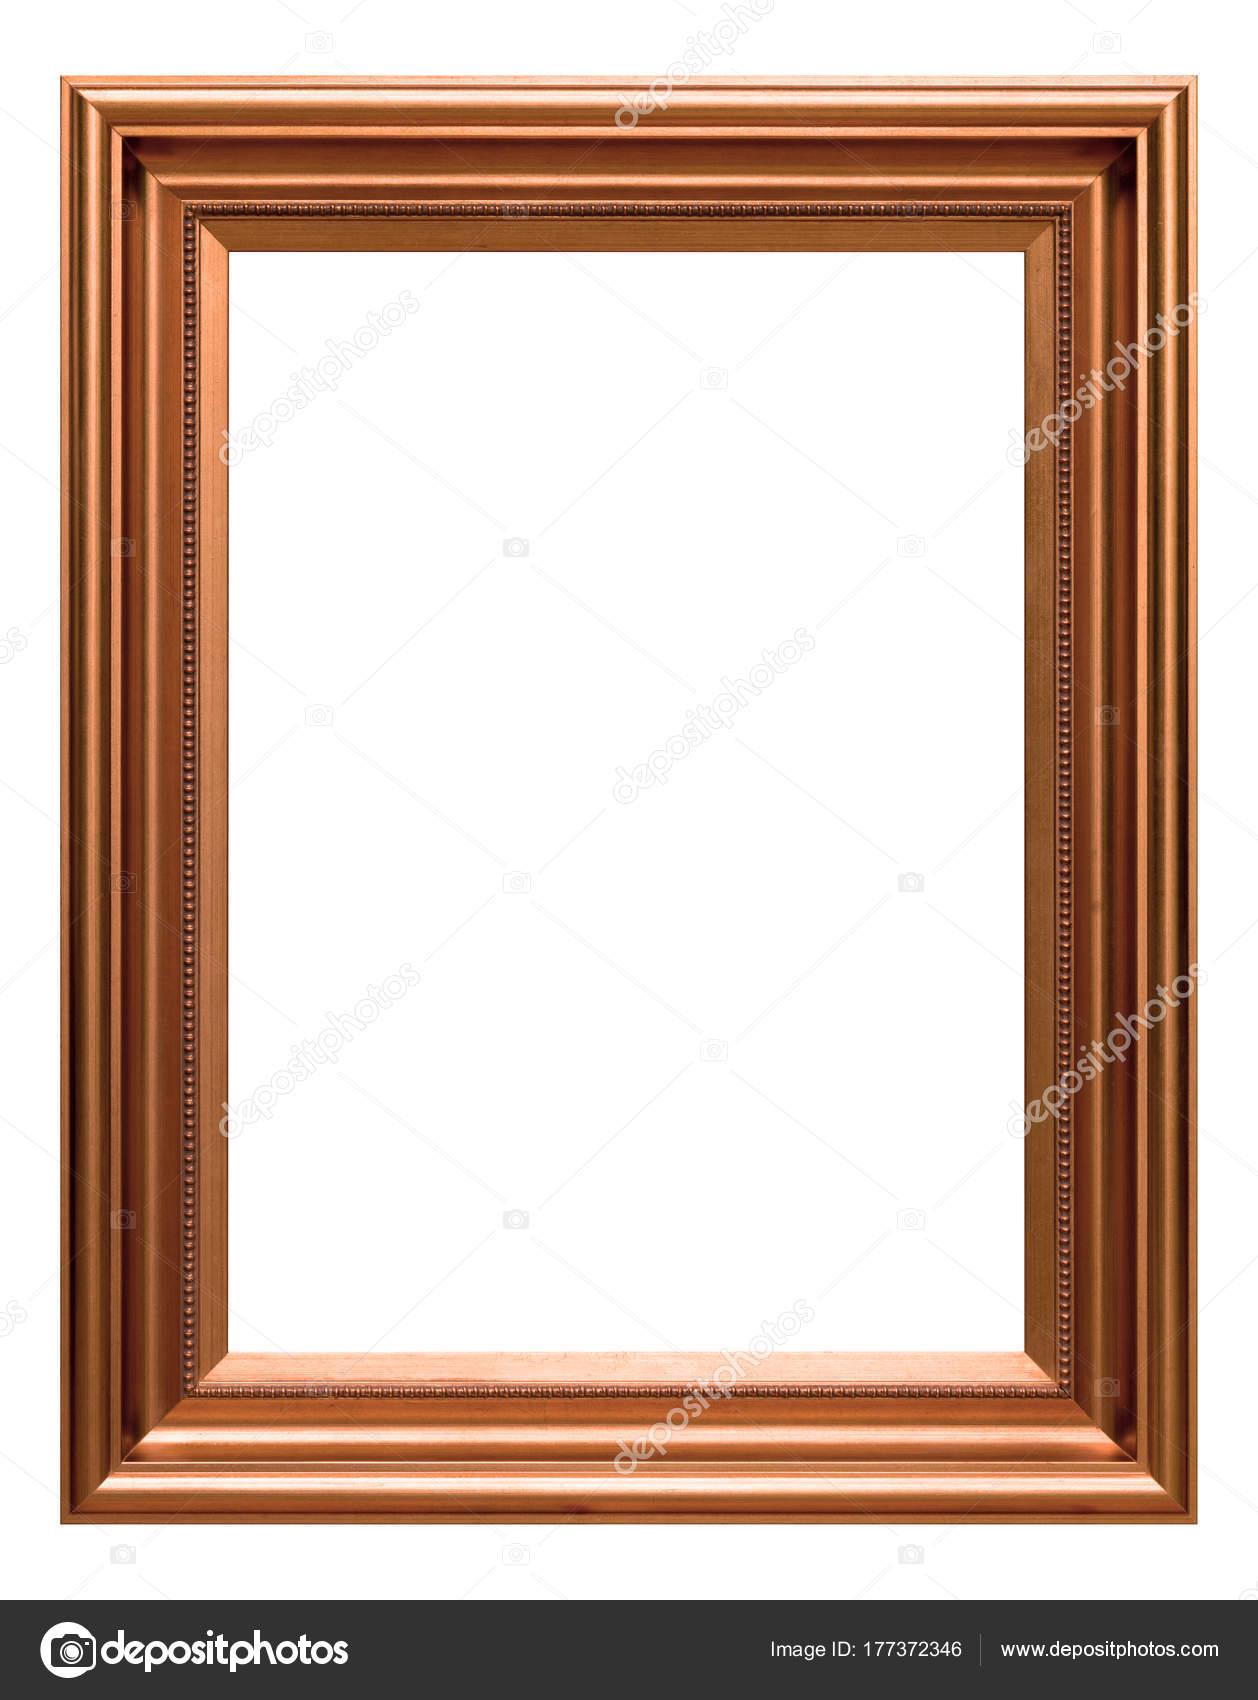 Antique copper frame — Stock Photo © opasstudio #177372346